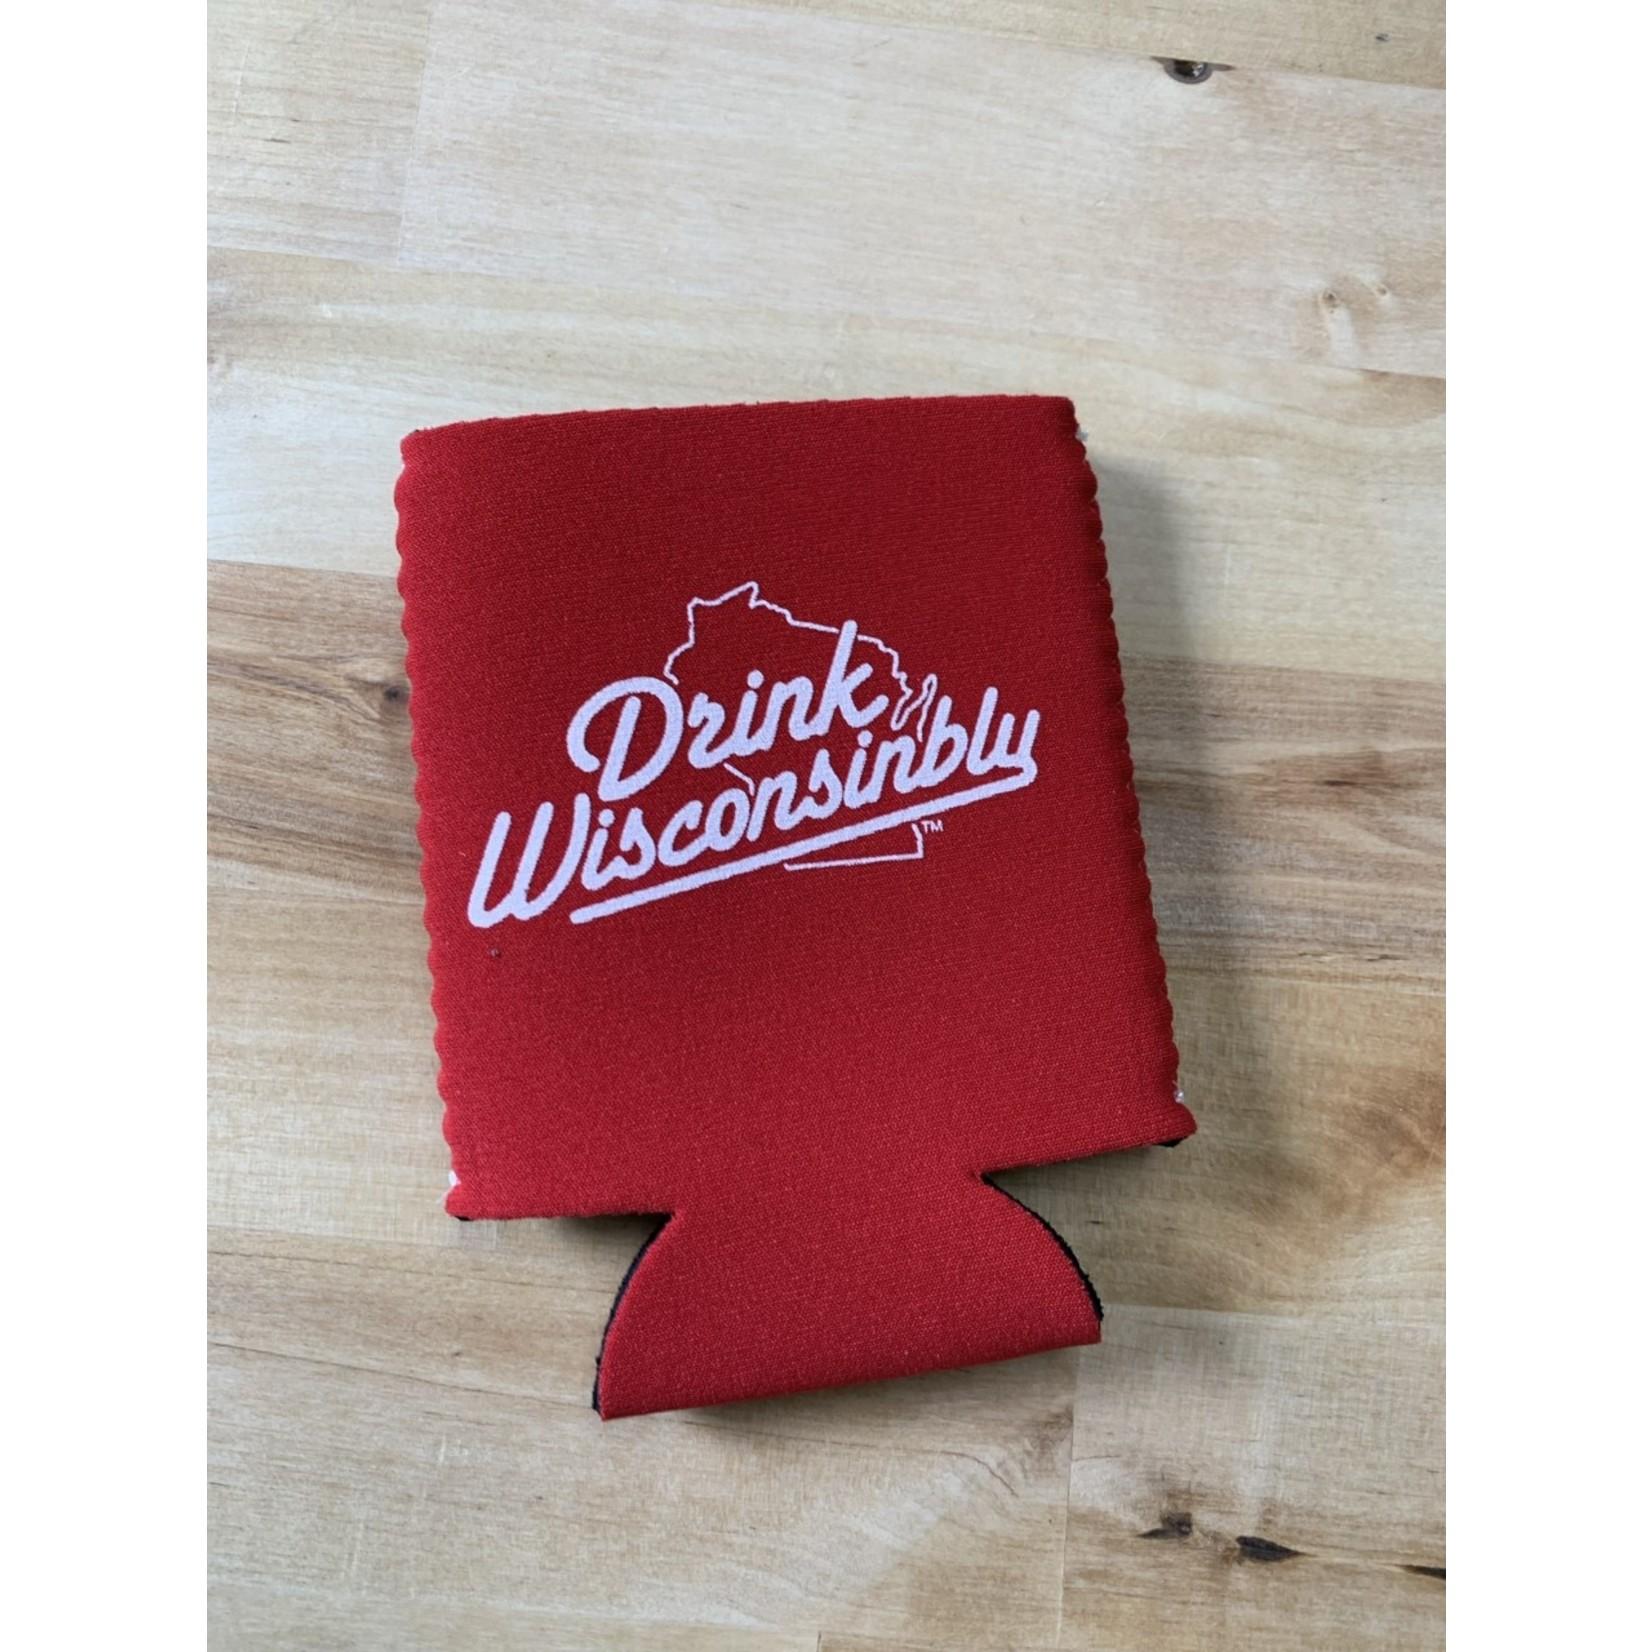 Drink Wisconsinbly Koozie Red/White